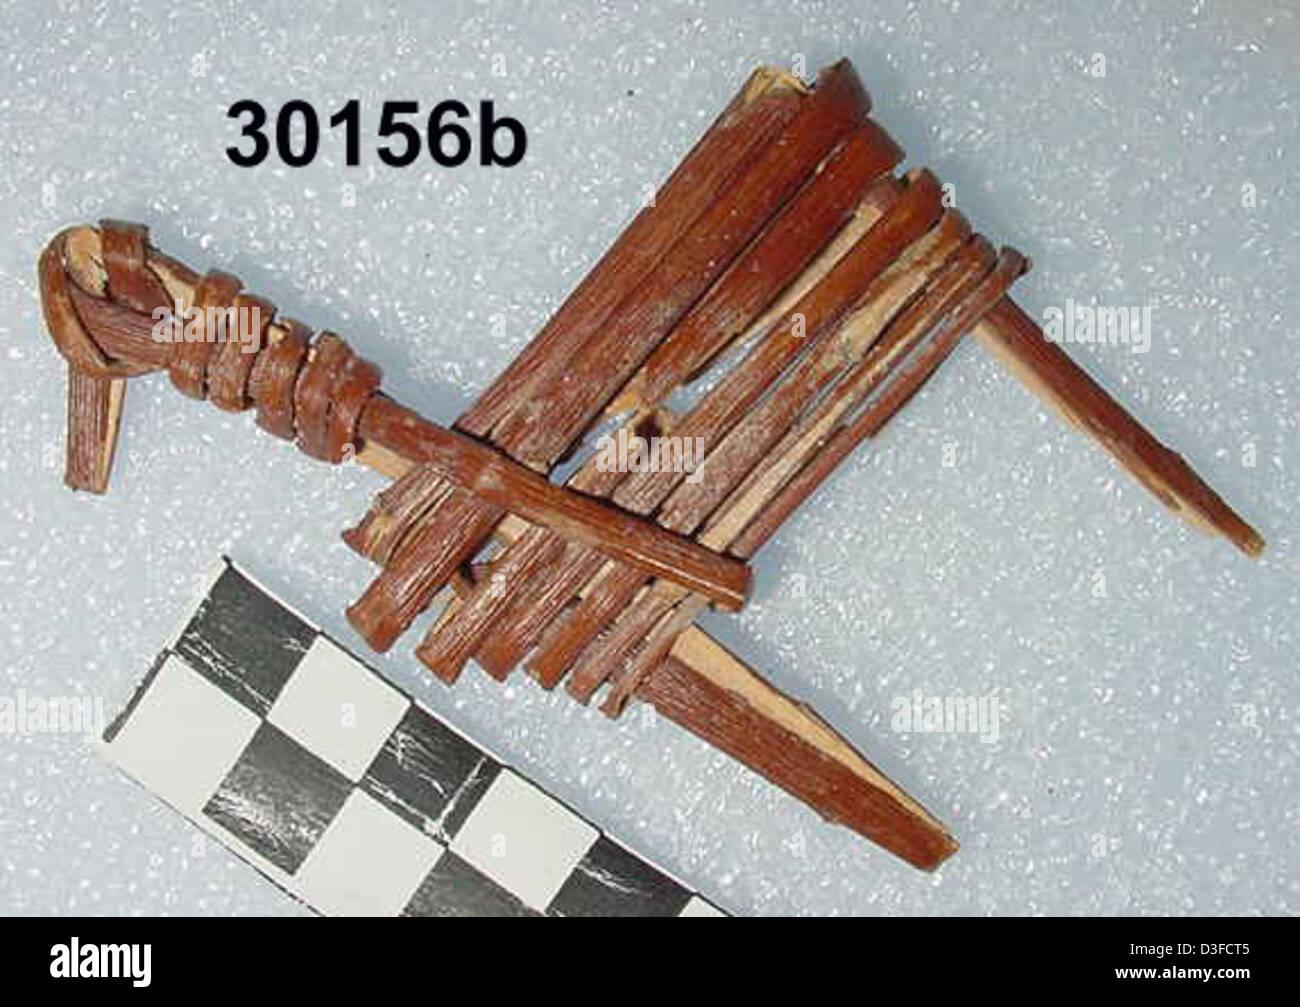 Split-Twig Figurine GRCA_30156b - Stock Image